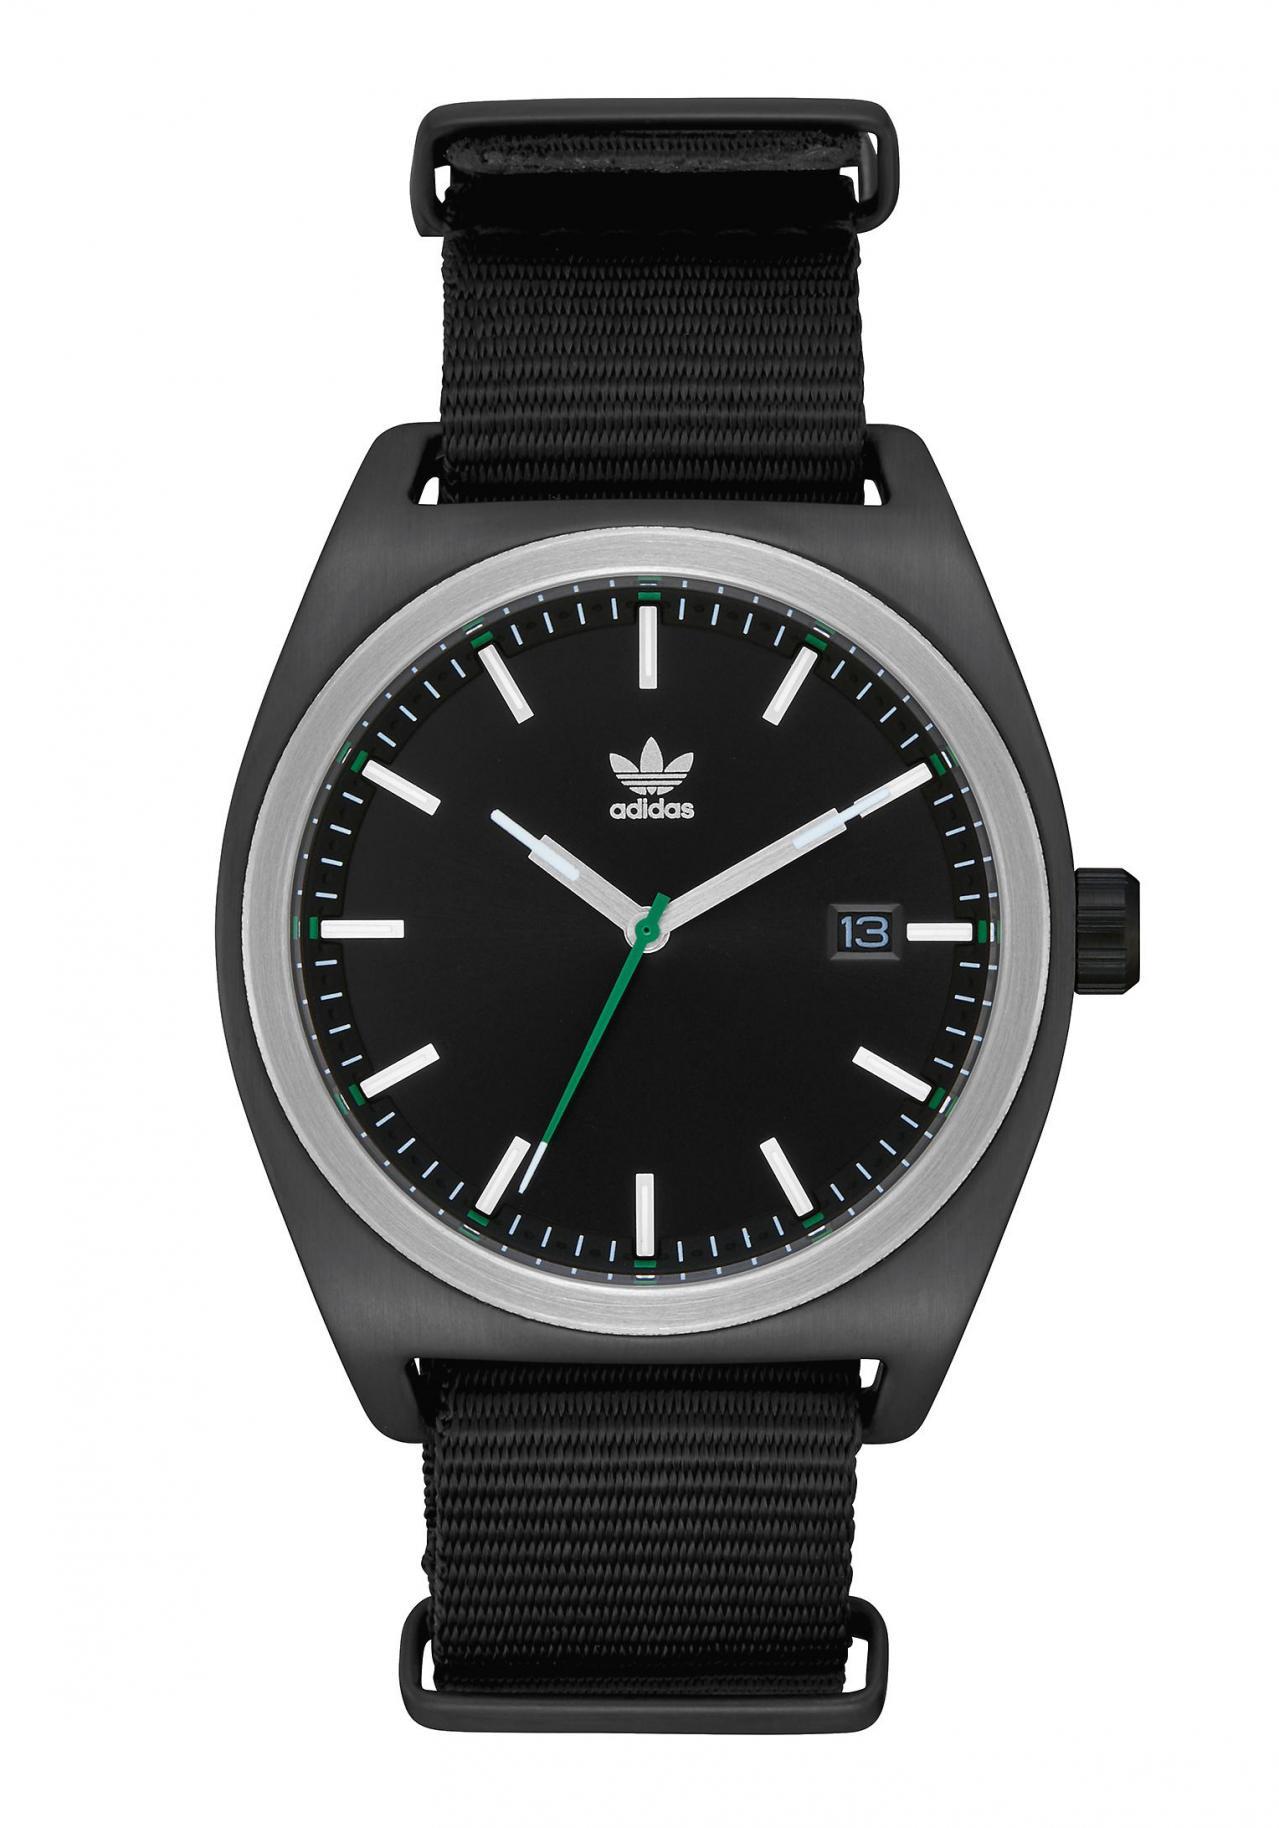 Adidas Process Black / Silver / Green / Black Armbanduhr